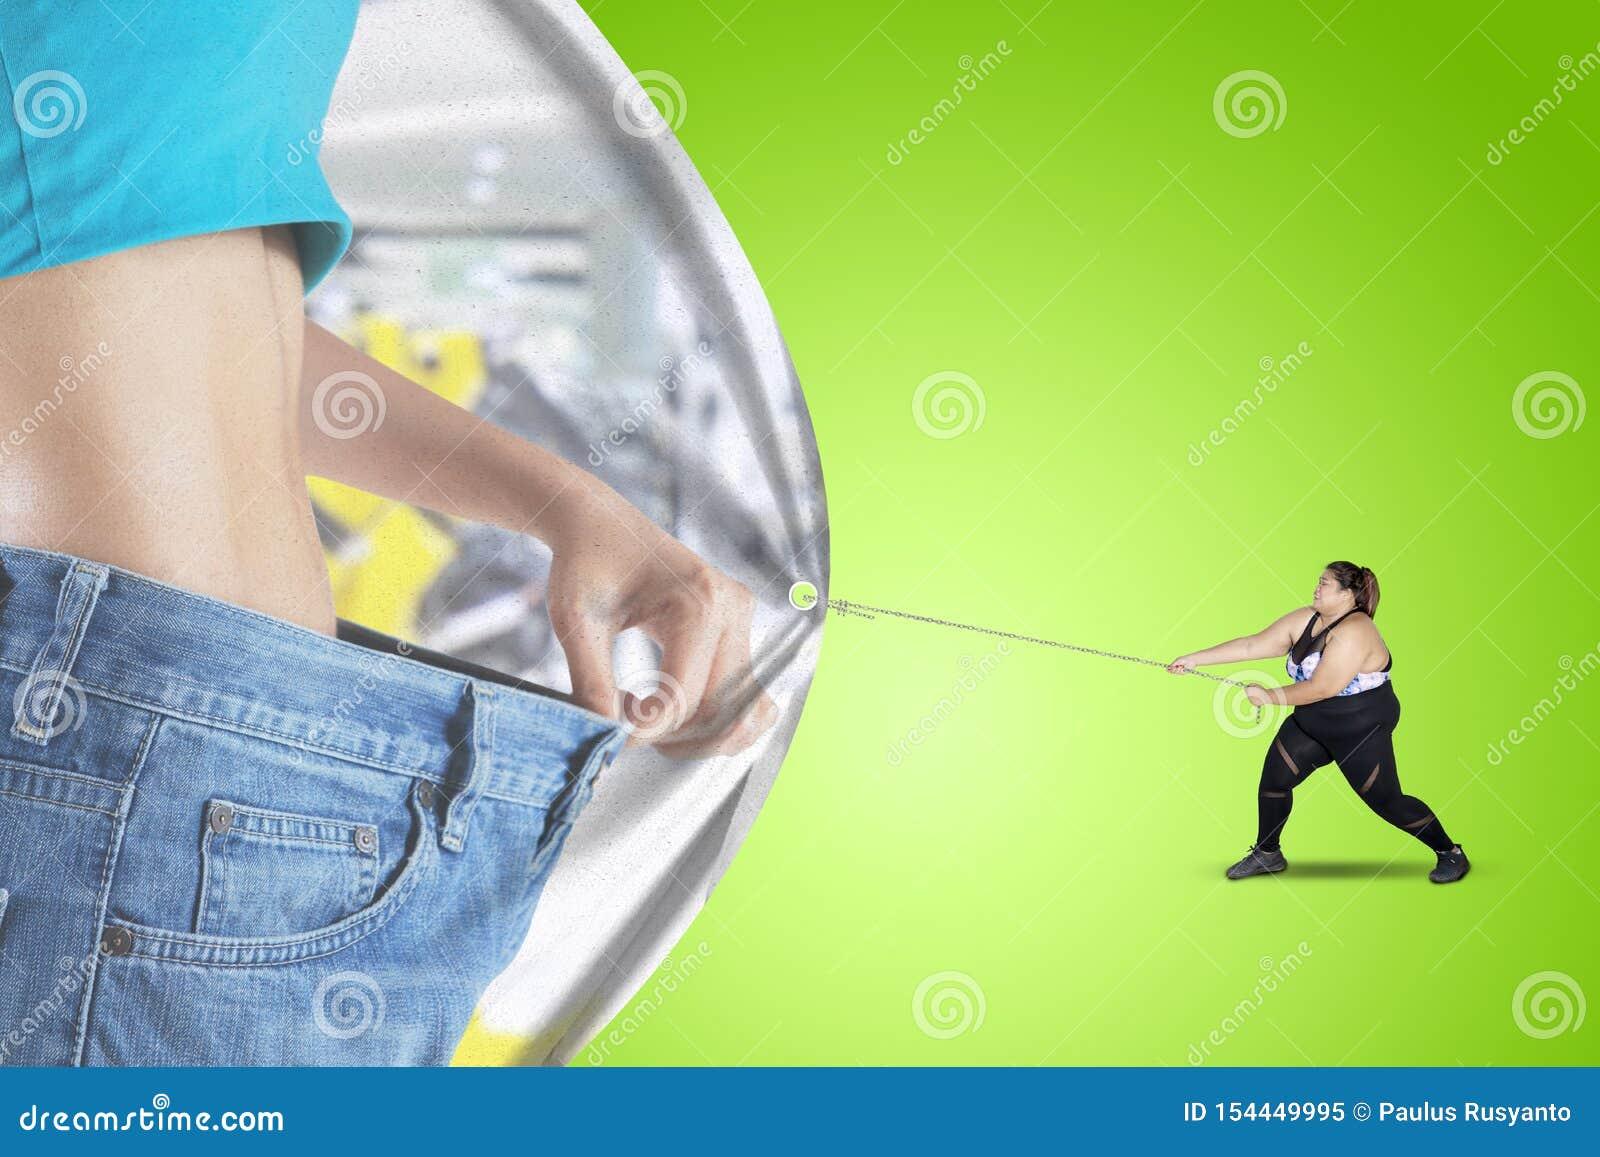 Den feta mannen drar ett baner med den slanka buken